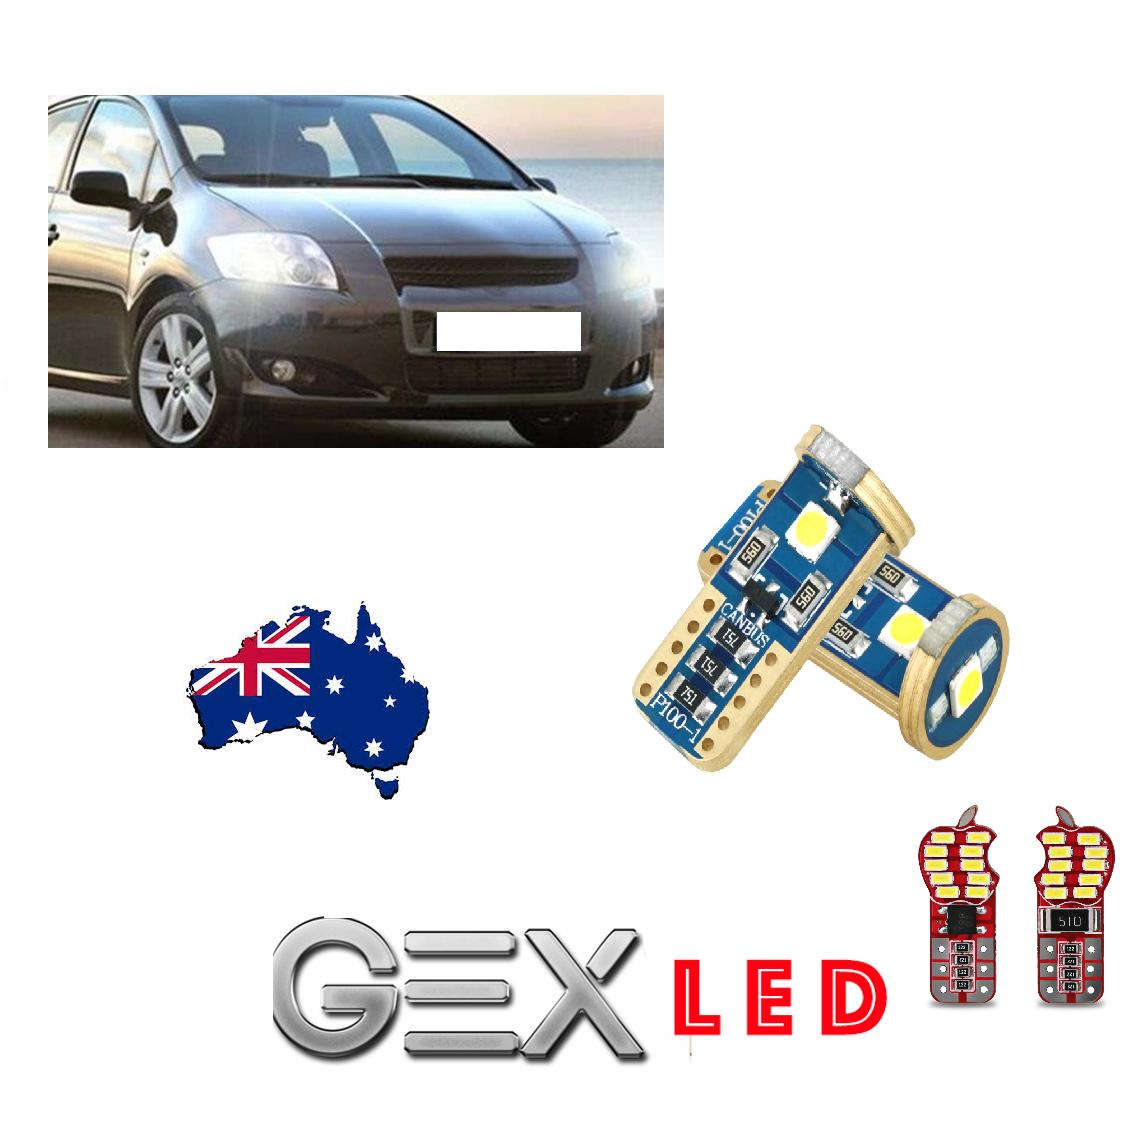 On sale Toyota Corolla plug & play led light parkers nuber plate